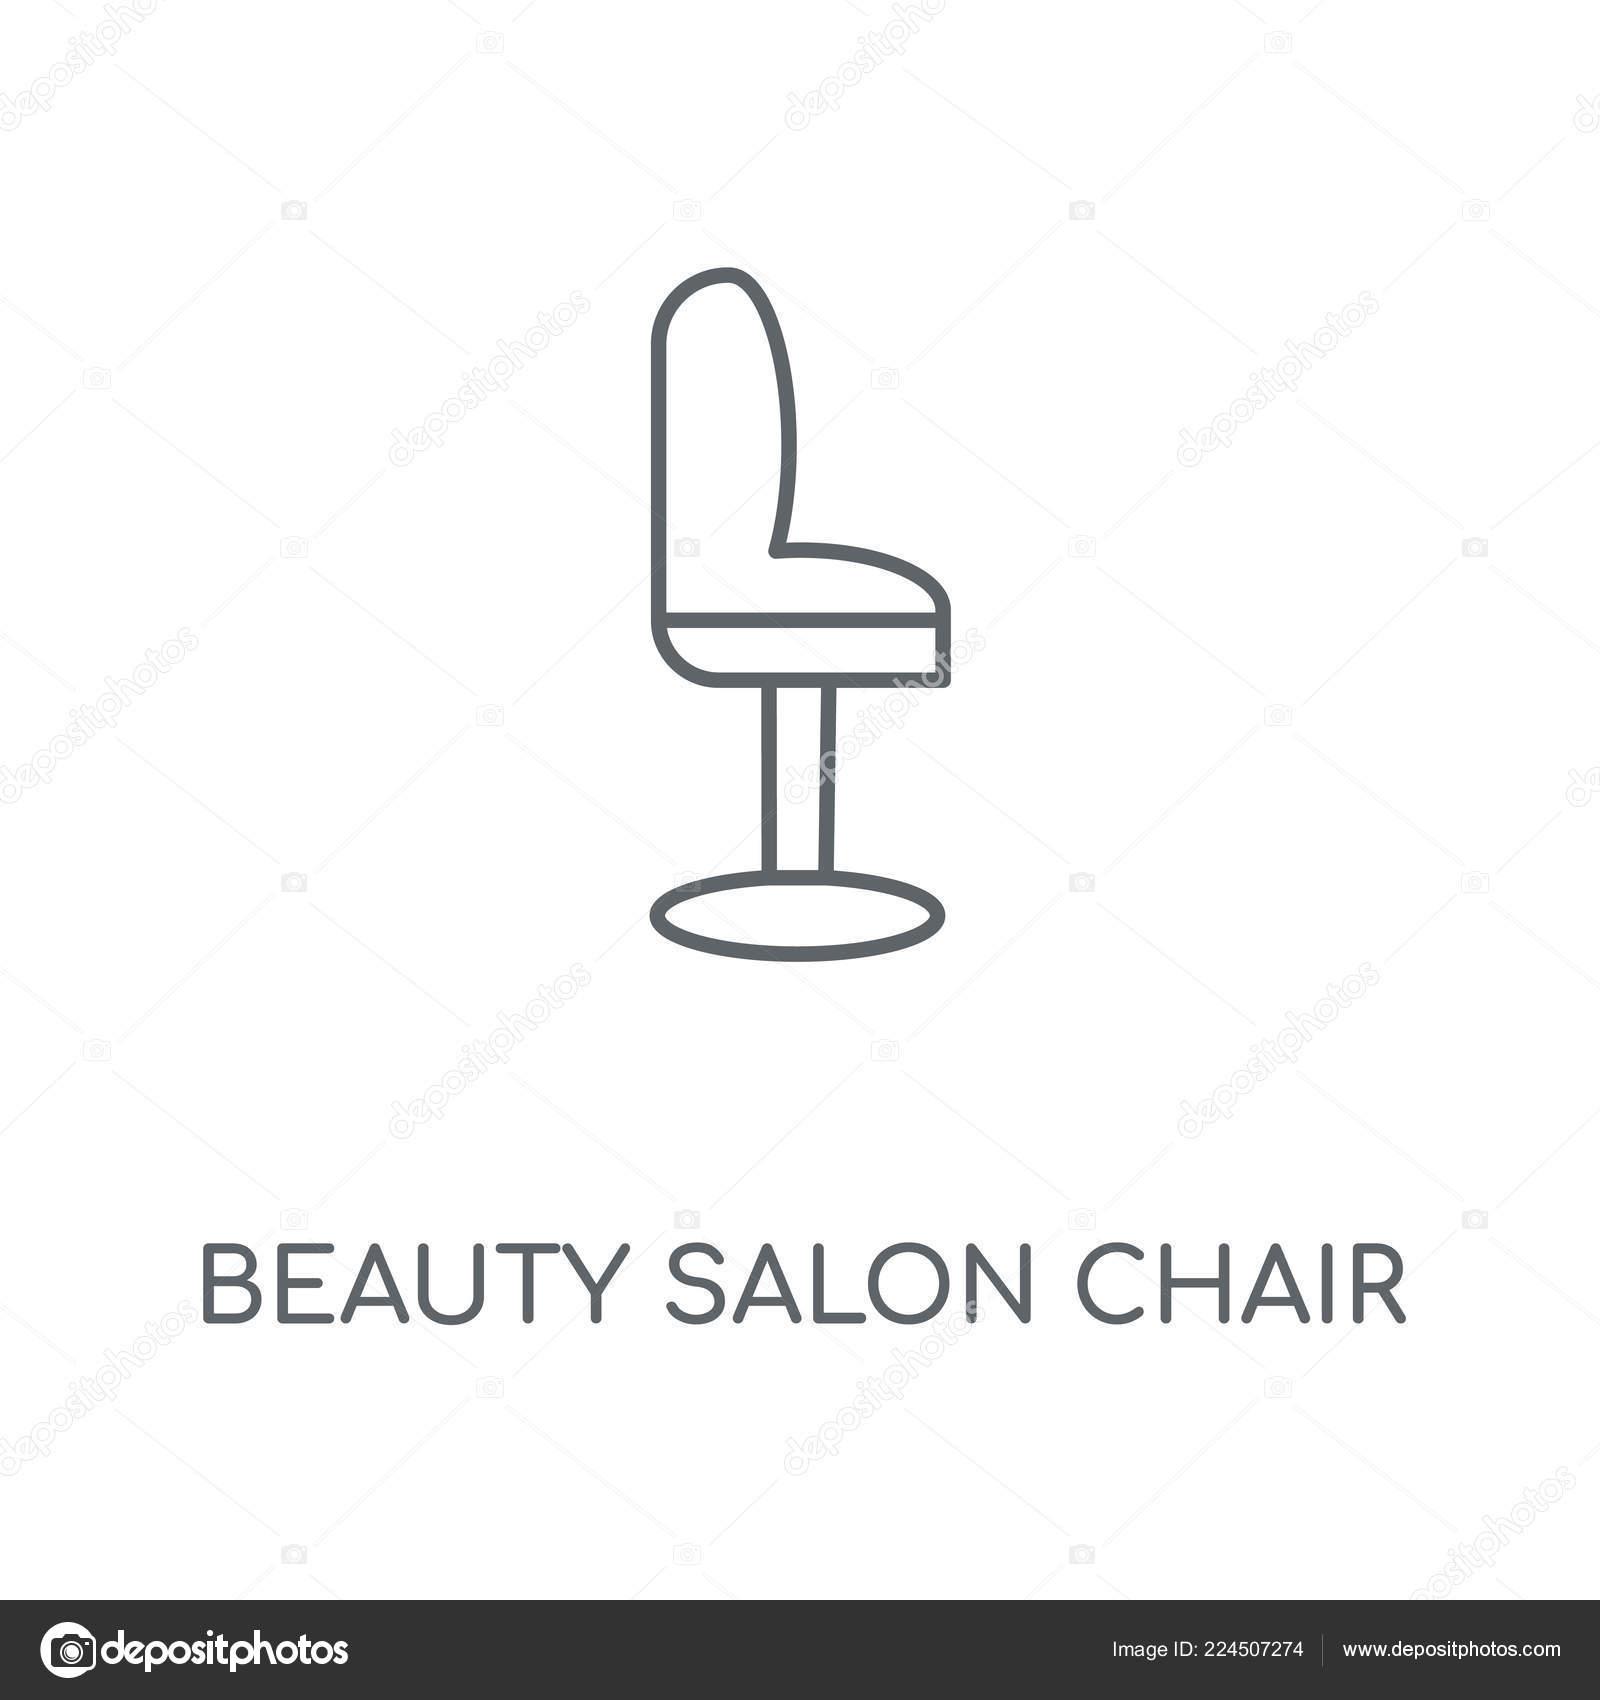 Miraculous Beauty Salon Chair Linear Icon Beauty Salon Chair Concept Home Interior And Landscaping Eliaenasavecom